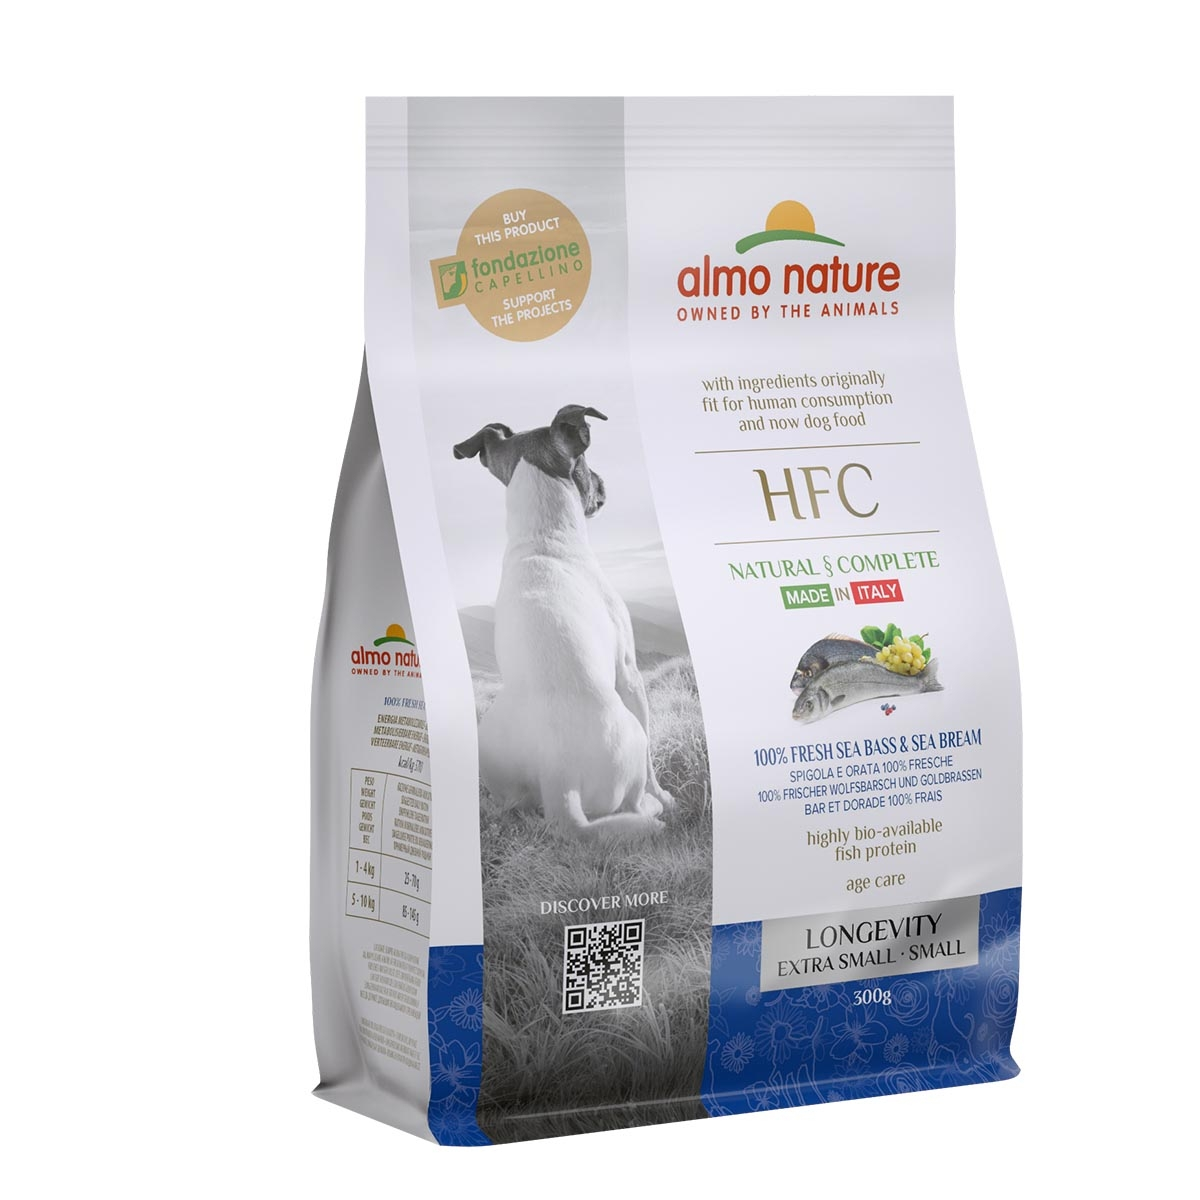 DOG DRY HFC ADULT SMALL LONGEVITY LUBINA Y BESUGO 300G